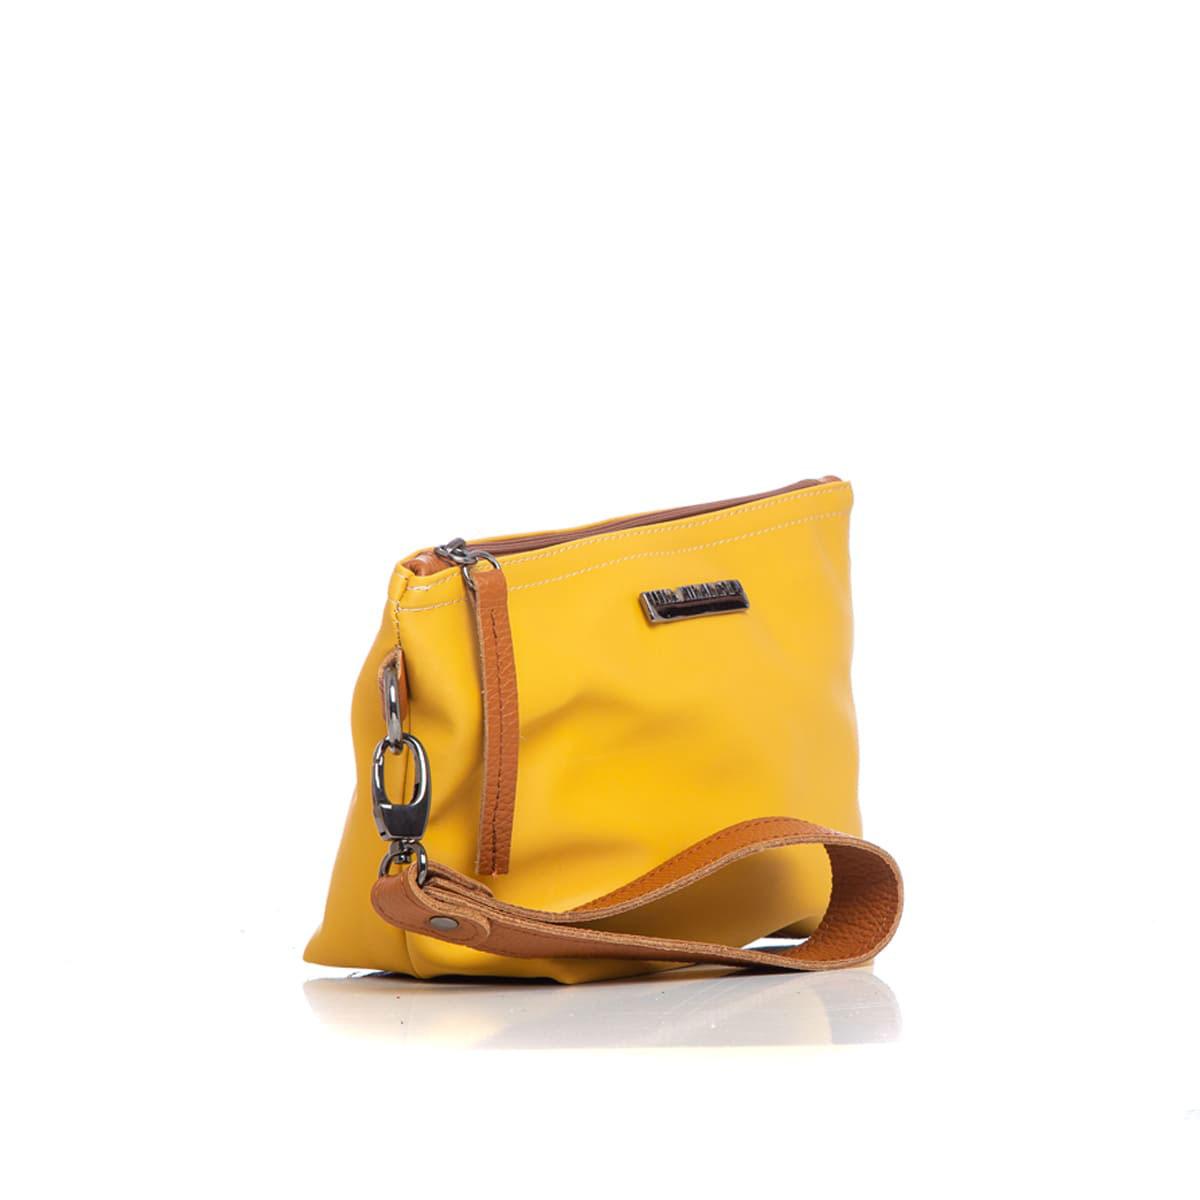 Satin Clutch Yellow